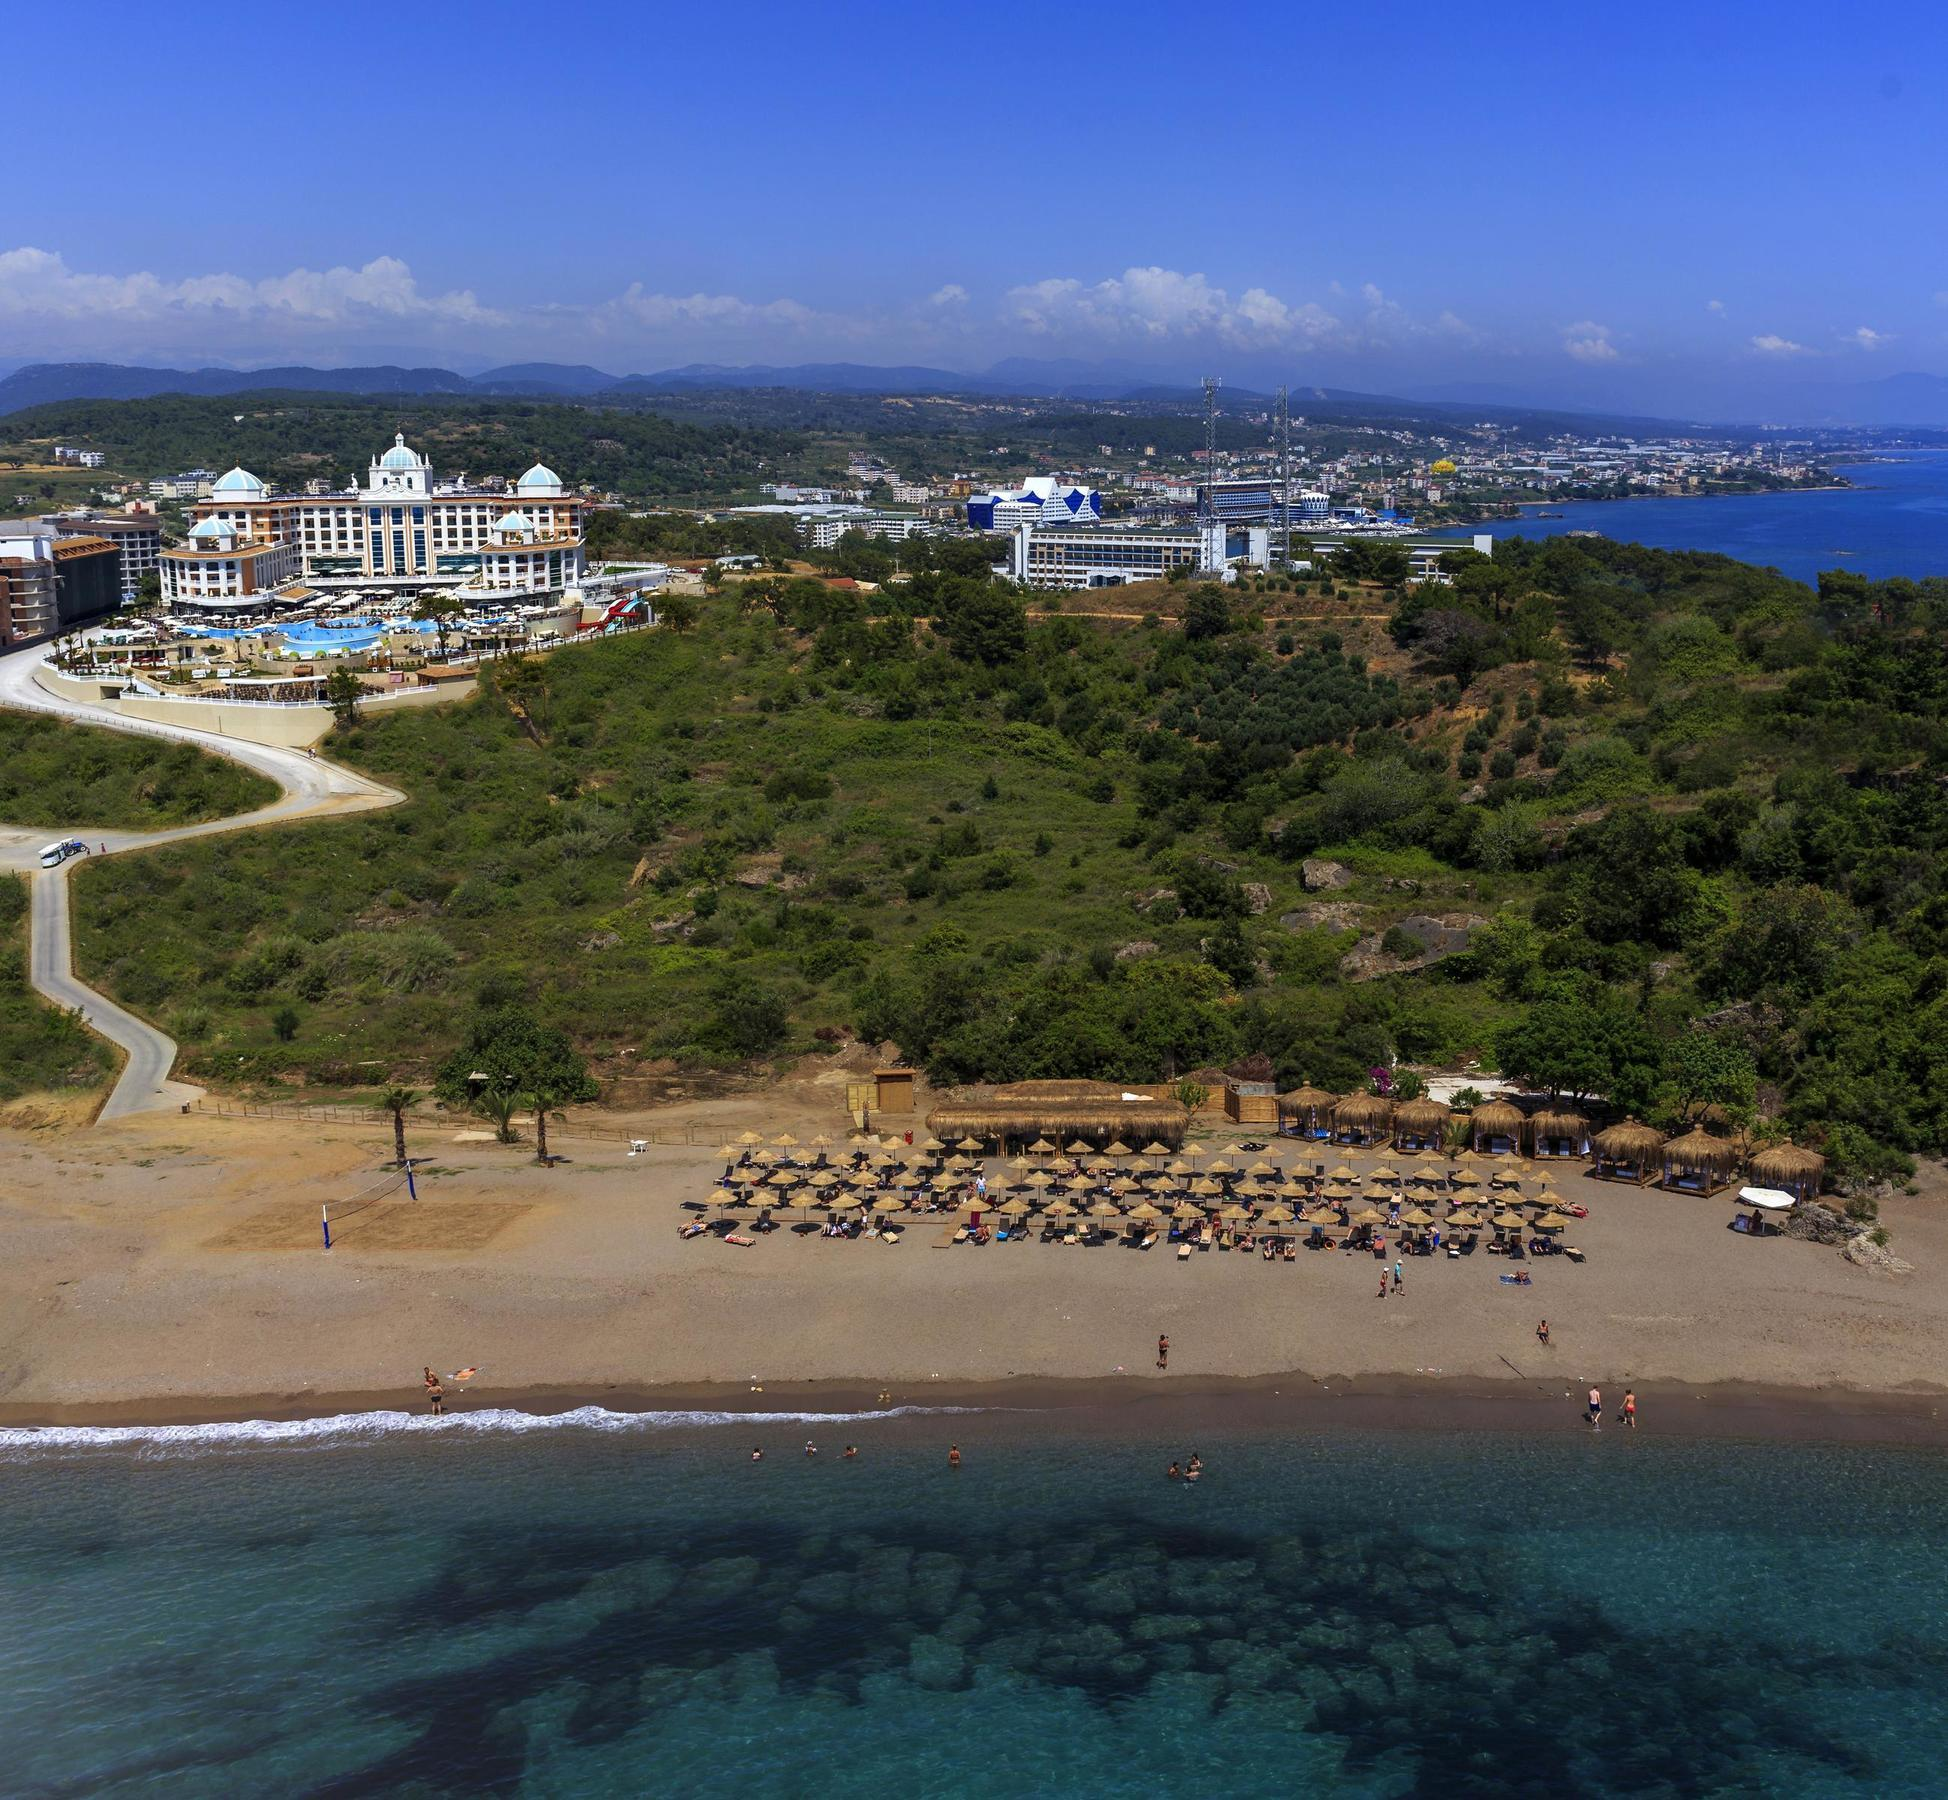 LITORE RESORT HOTEL & SPA ALANYA - Alanya, Turkey